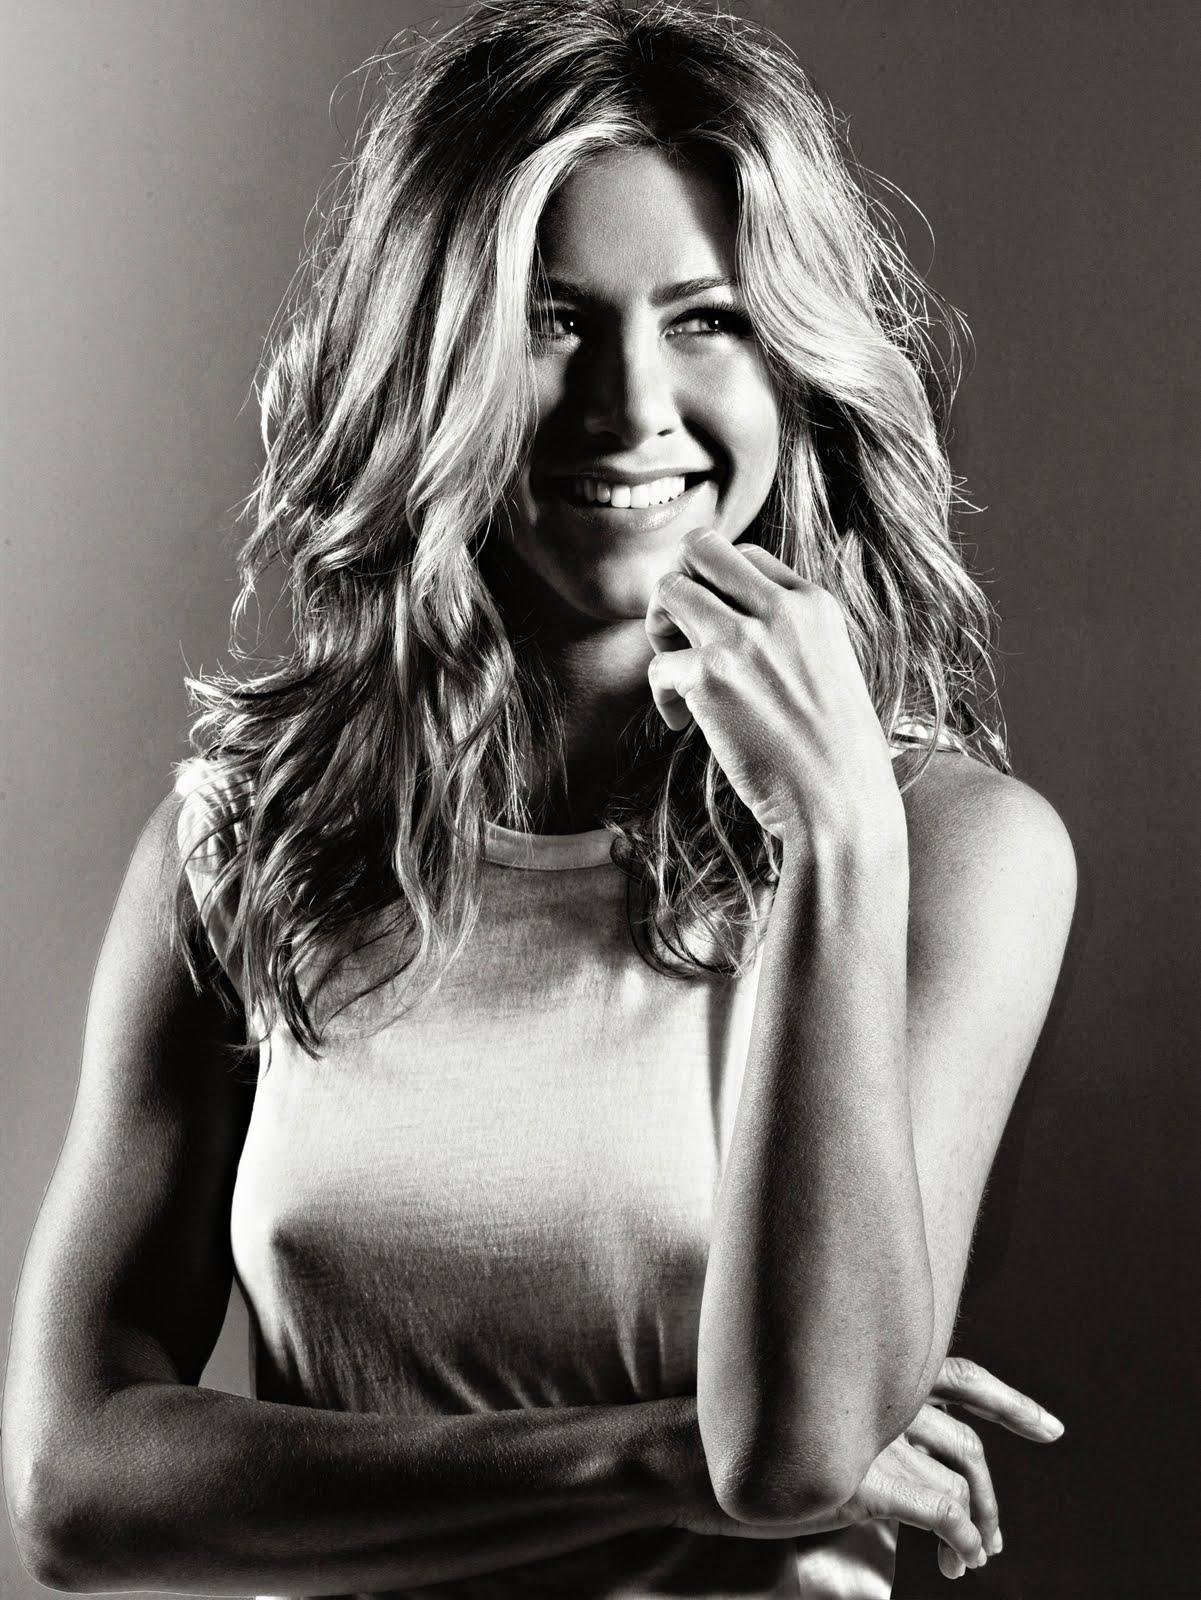 Naked-Joe Jennifer Aniston-6638